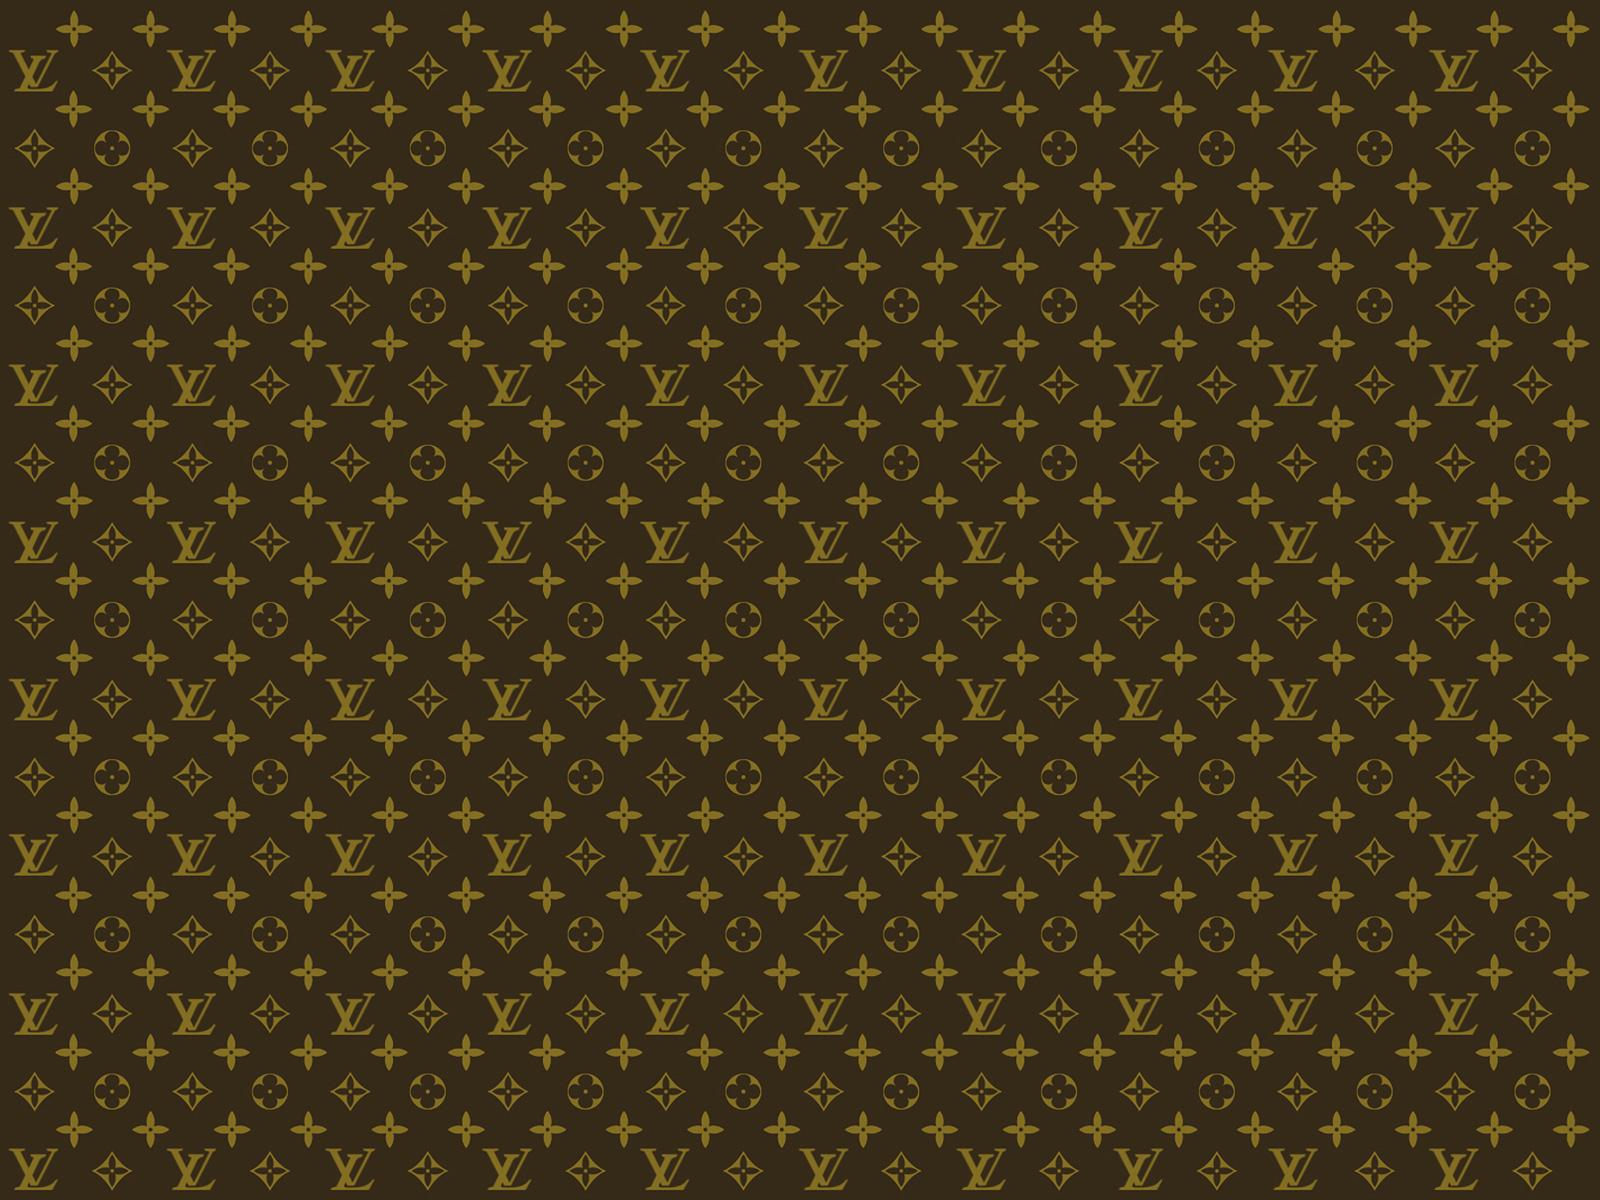 Louis vuitton ipad wallpaper free ipad retina hd wallpapers louis vuitton ipad wallpaper voltagebd Gallery